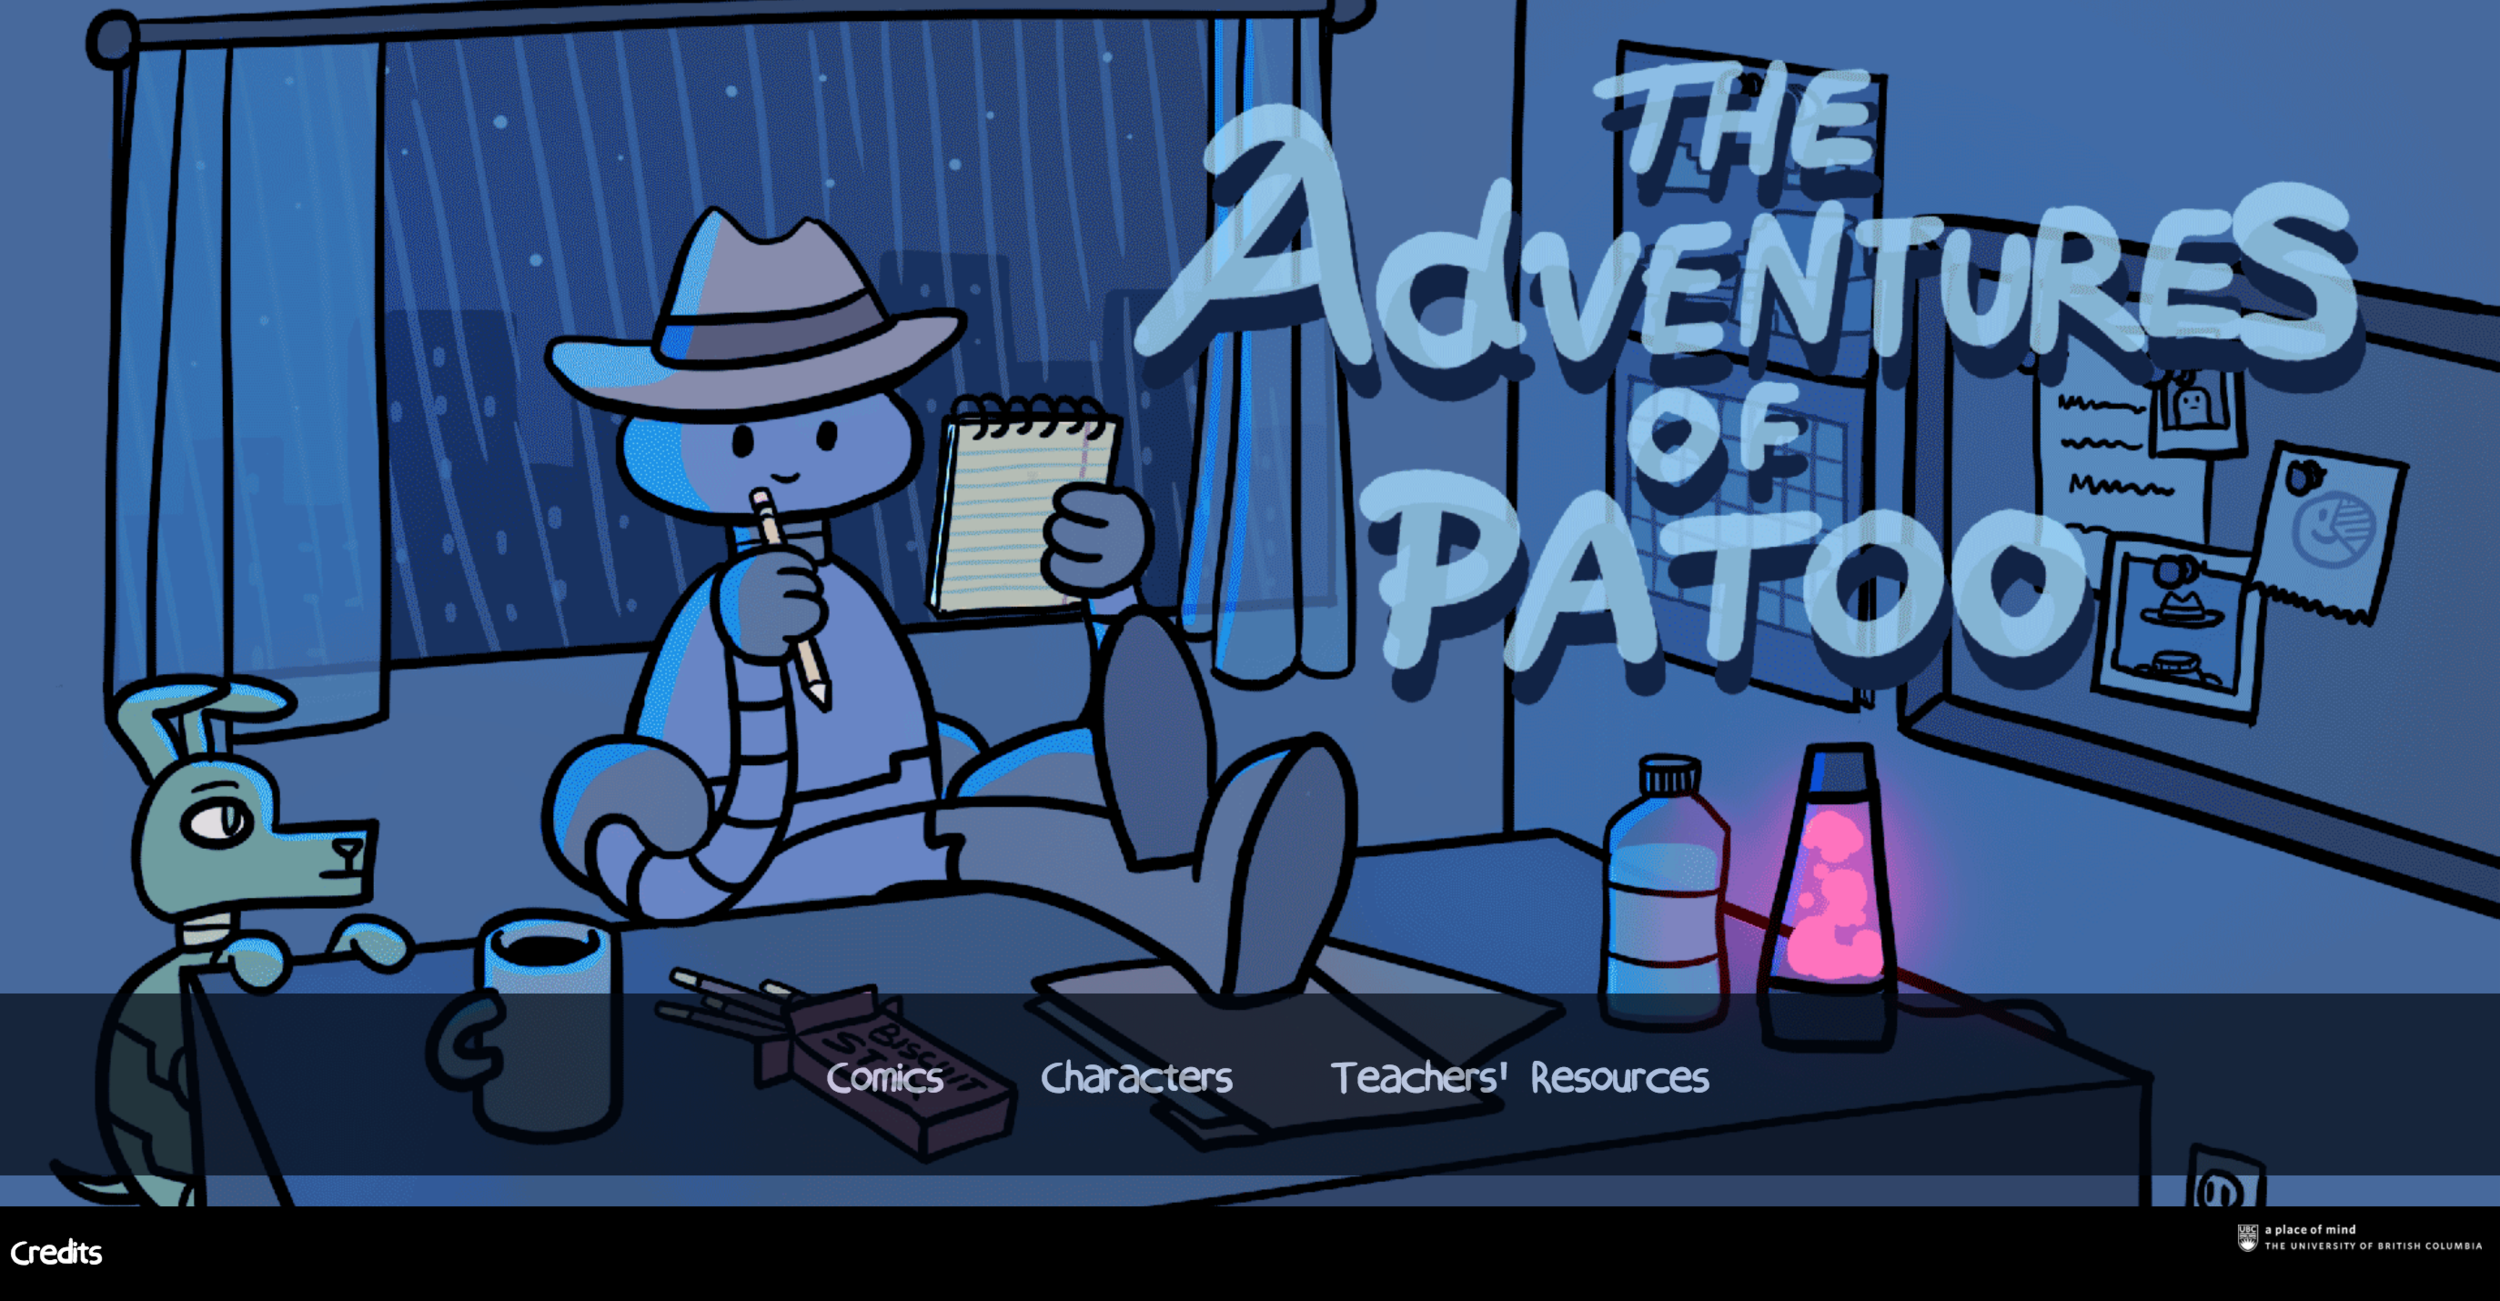 FireShot Capture 2 - Adventures of Patoo - http___adventuresofpatoo.herokuapp.com_.png